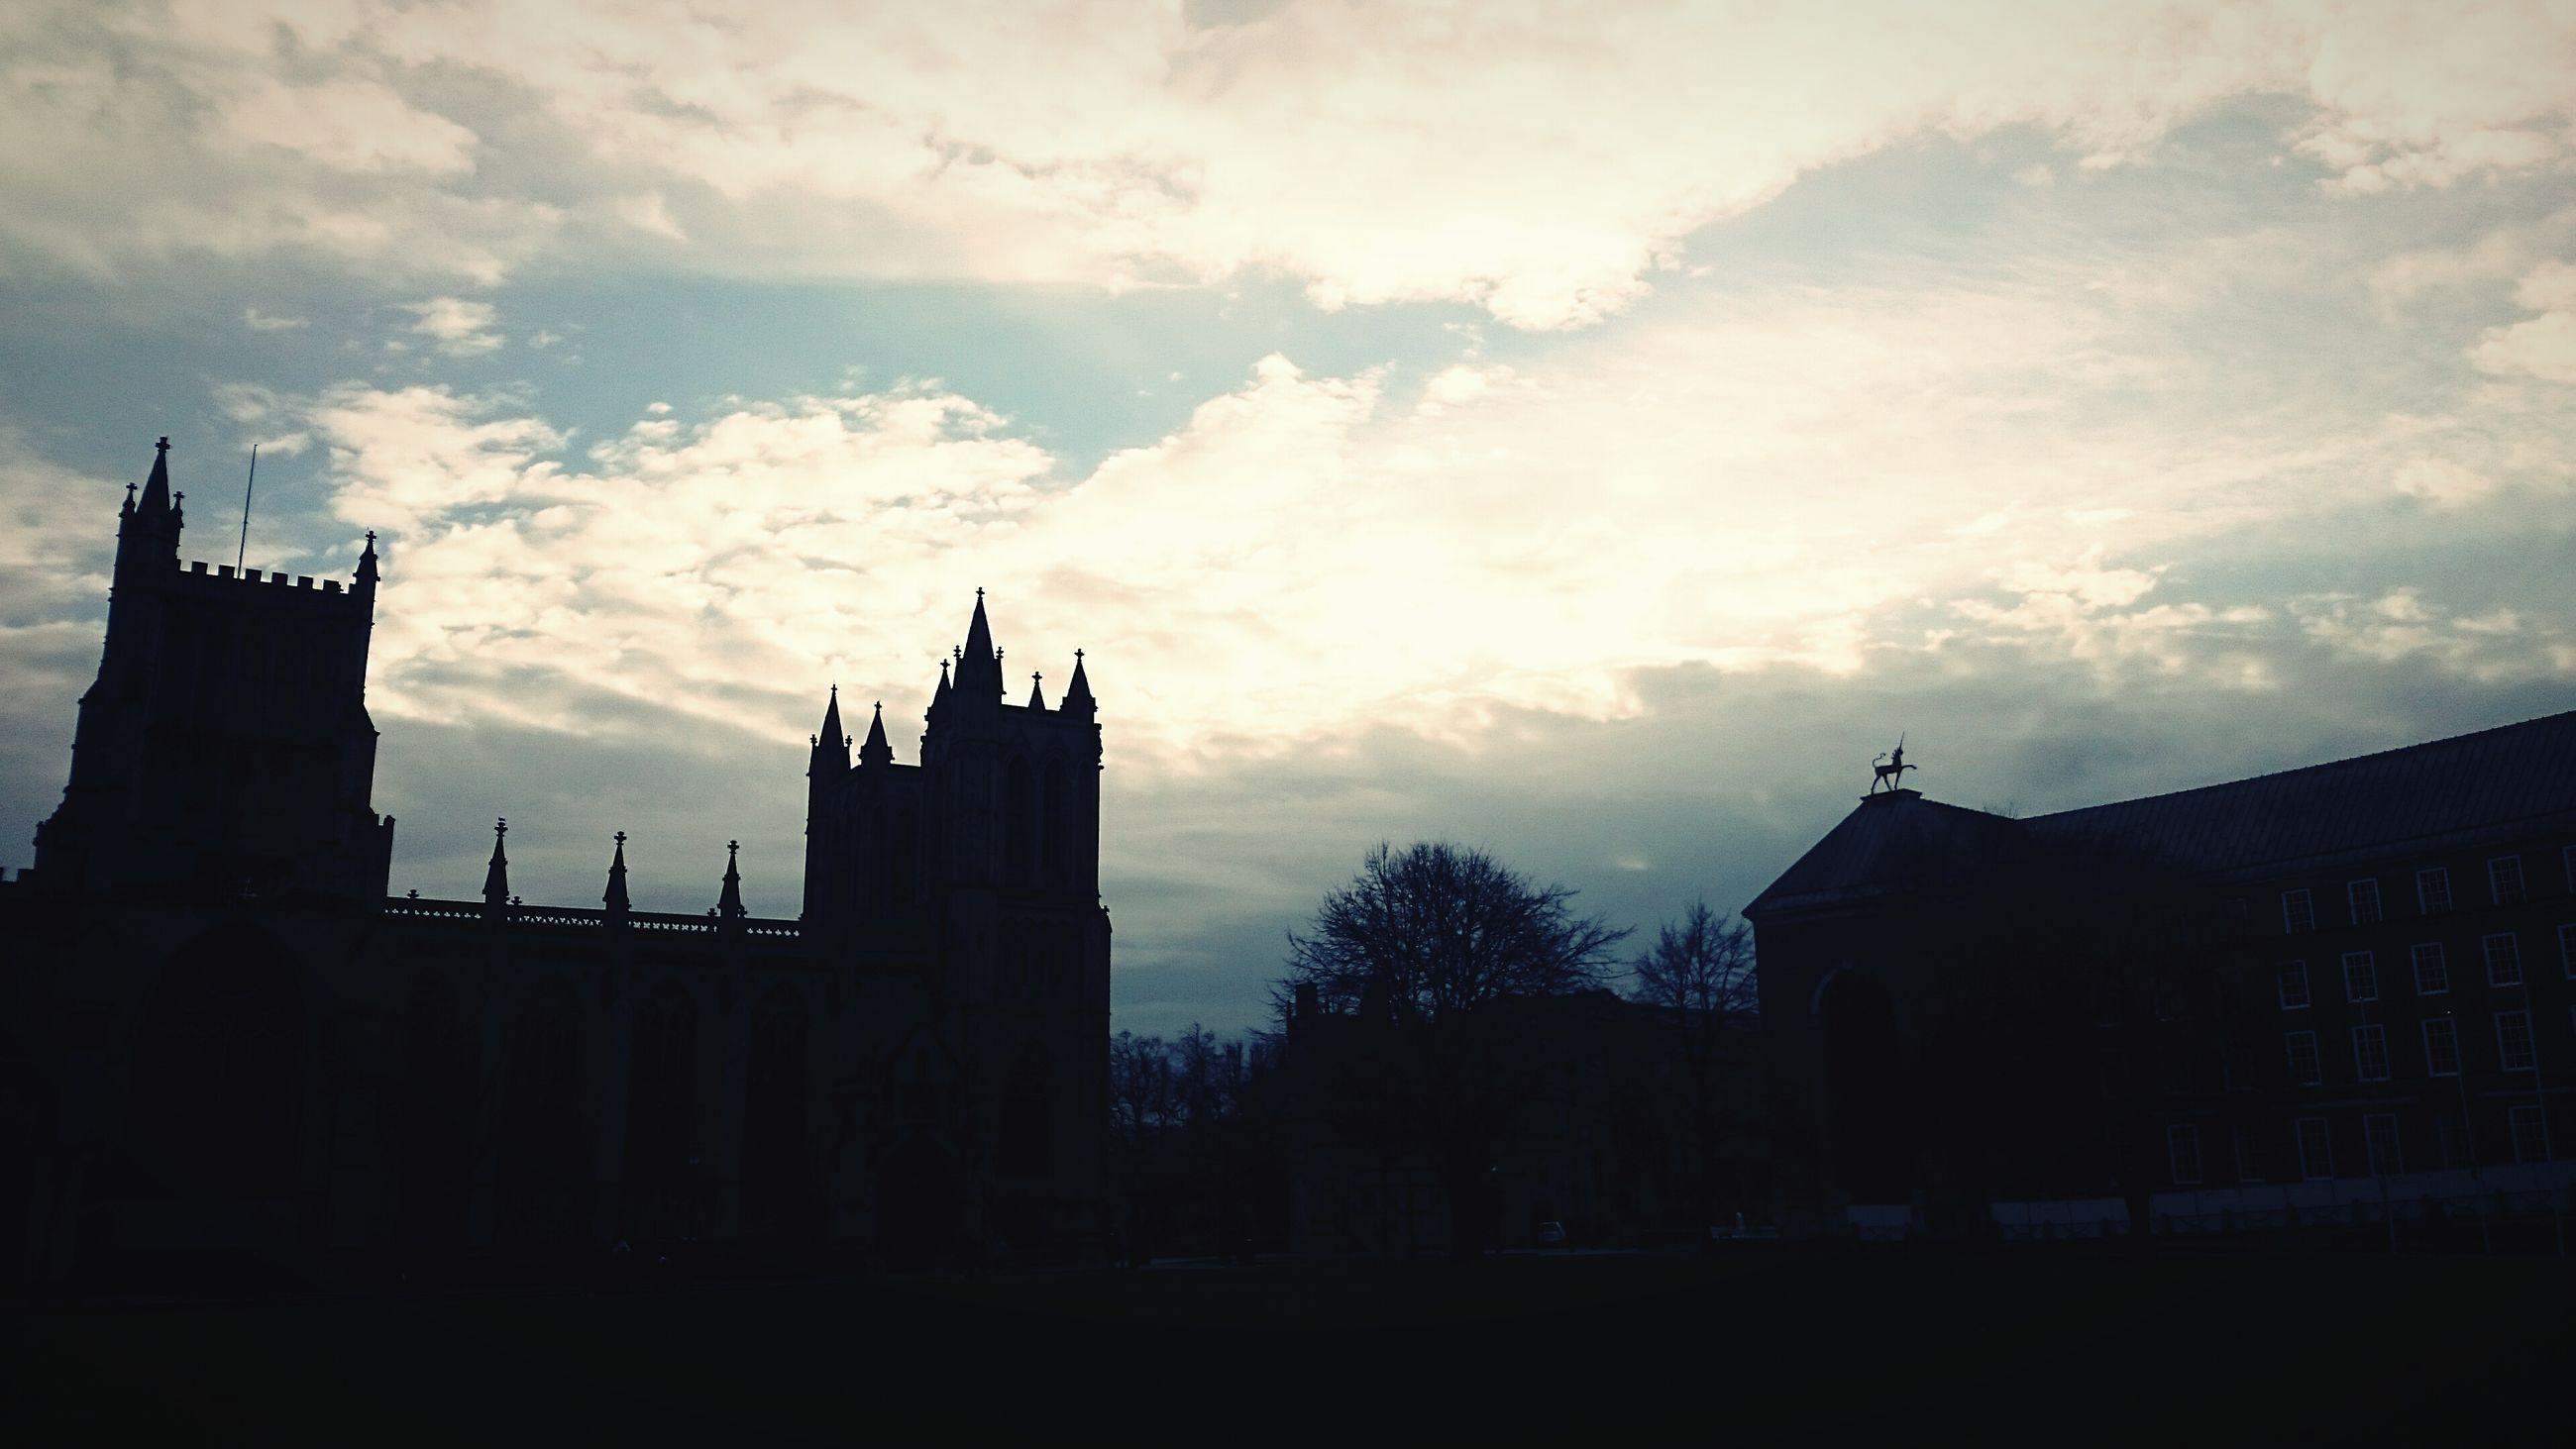 building exterior, architecture, silhouette, built structure, sky, sunset, cloud - sky, low angle view, cloud, building, dusk, city, cloudy, house, residential structure, residential building, outdoors, dark, outline, no people